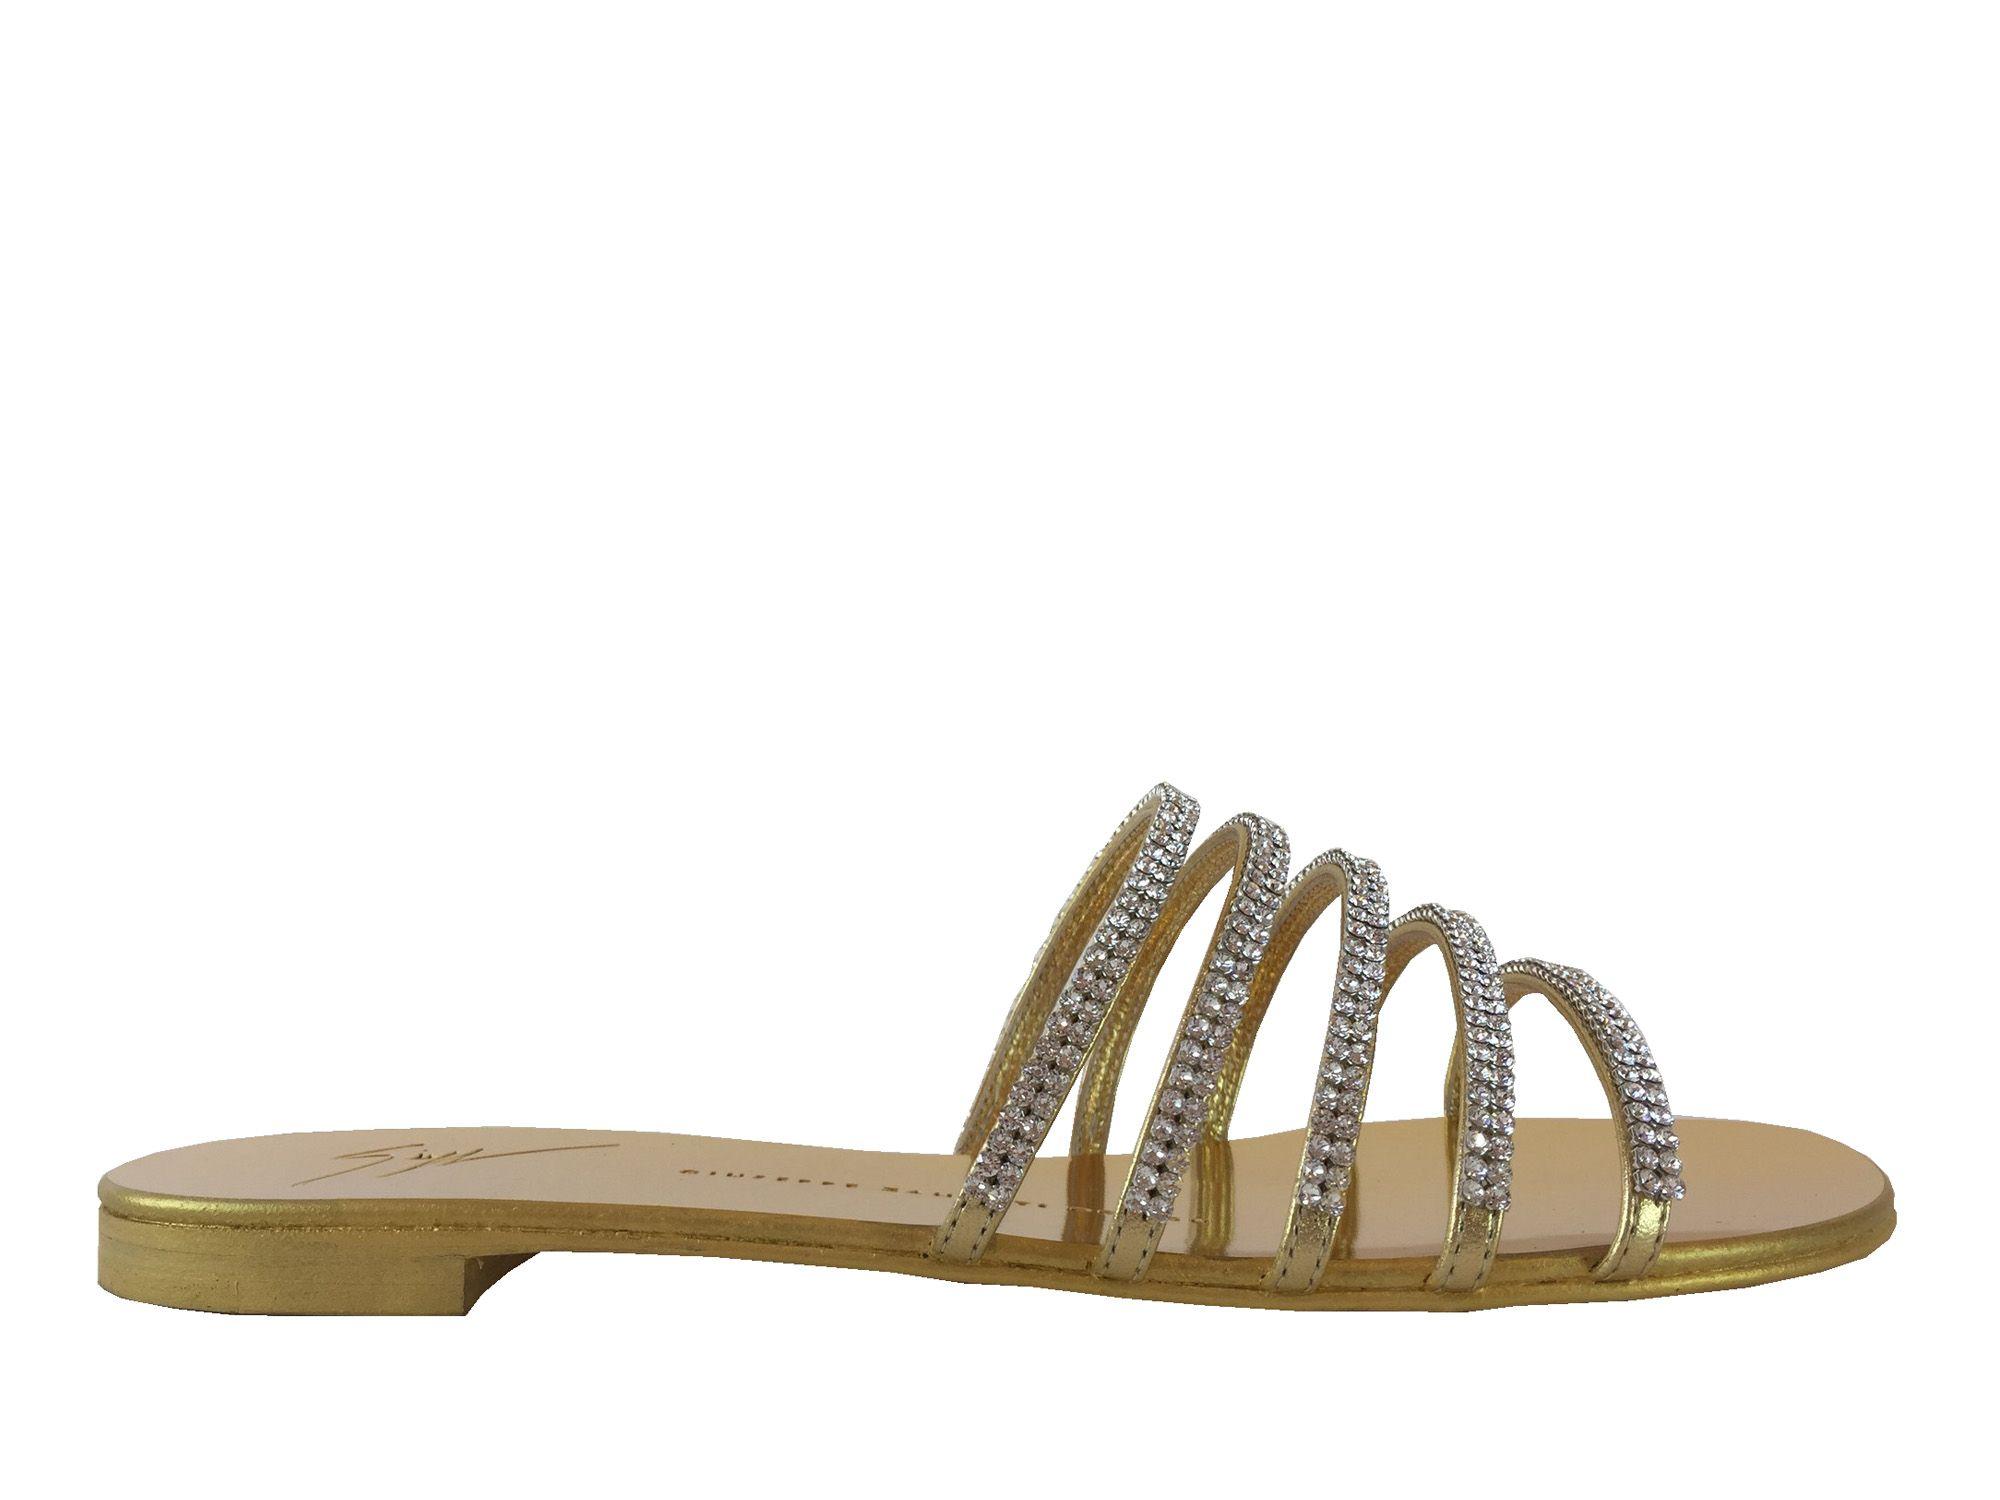 Nu-pieds Giuseppe Zanotti - Za Mule Strass en cuir or et strass argentés 062eabd79b1